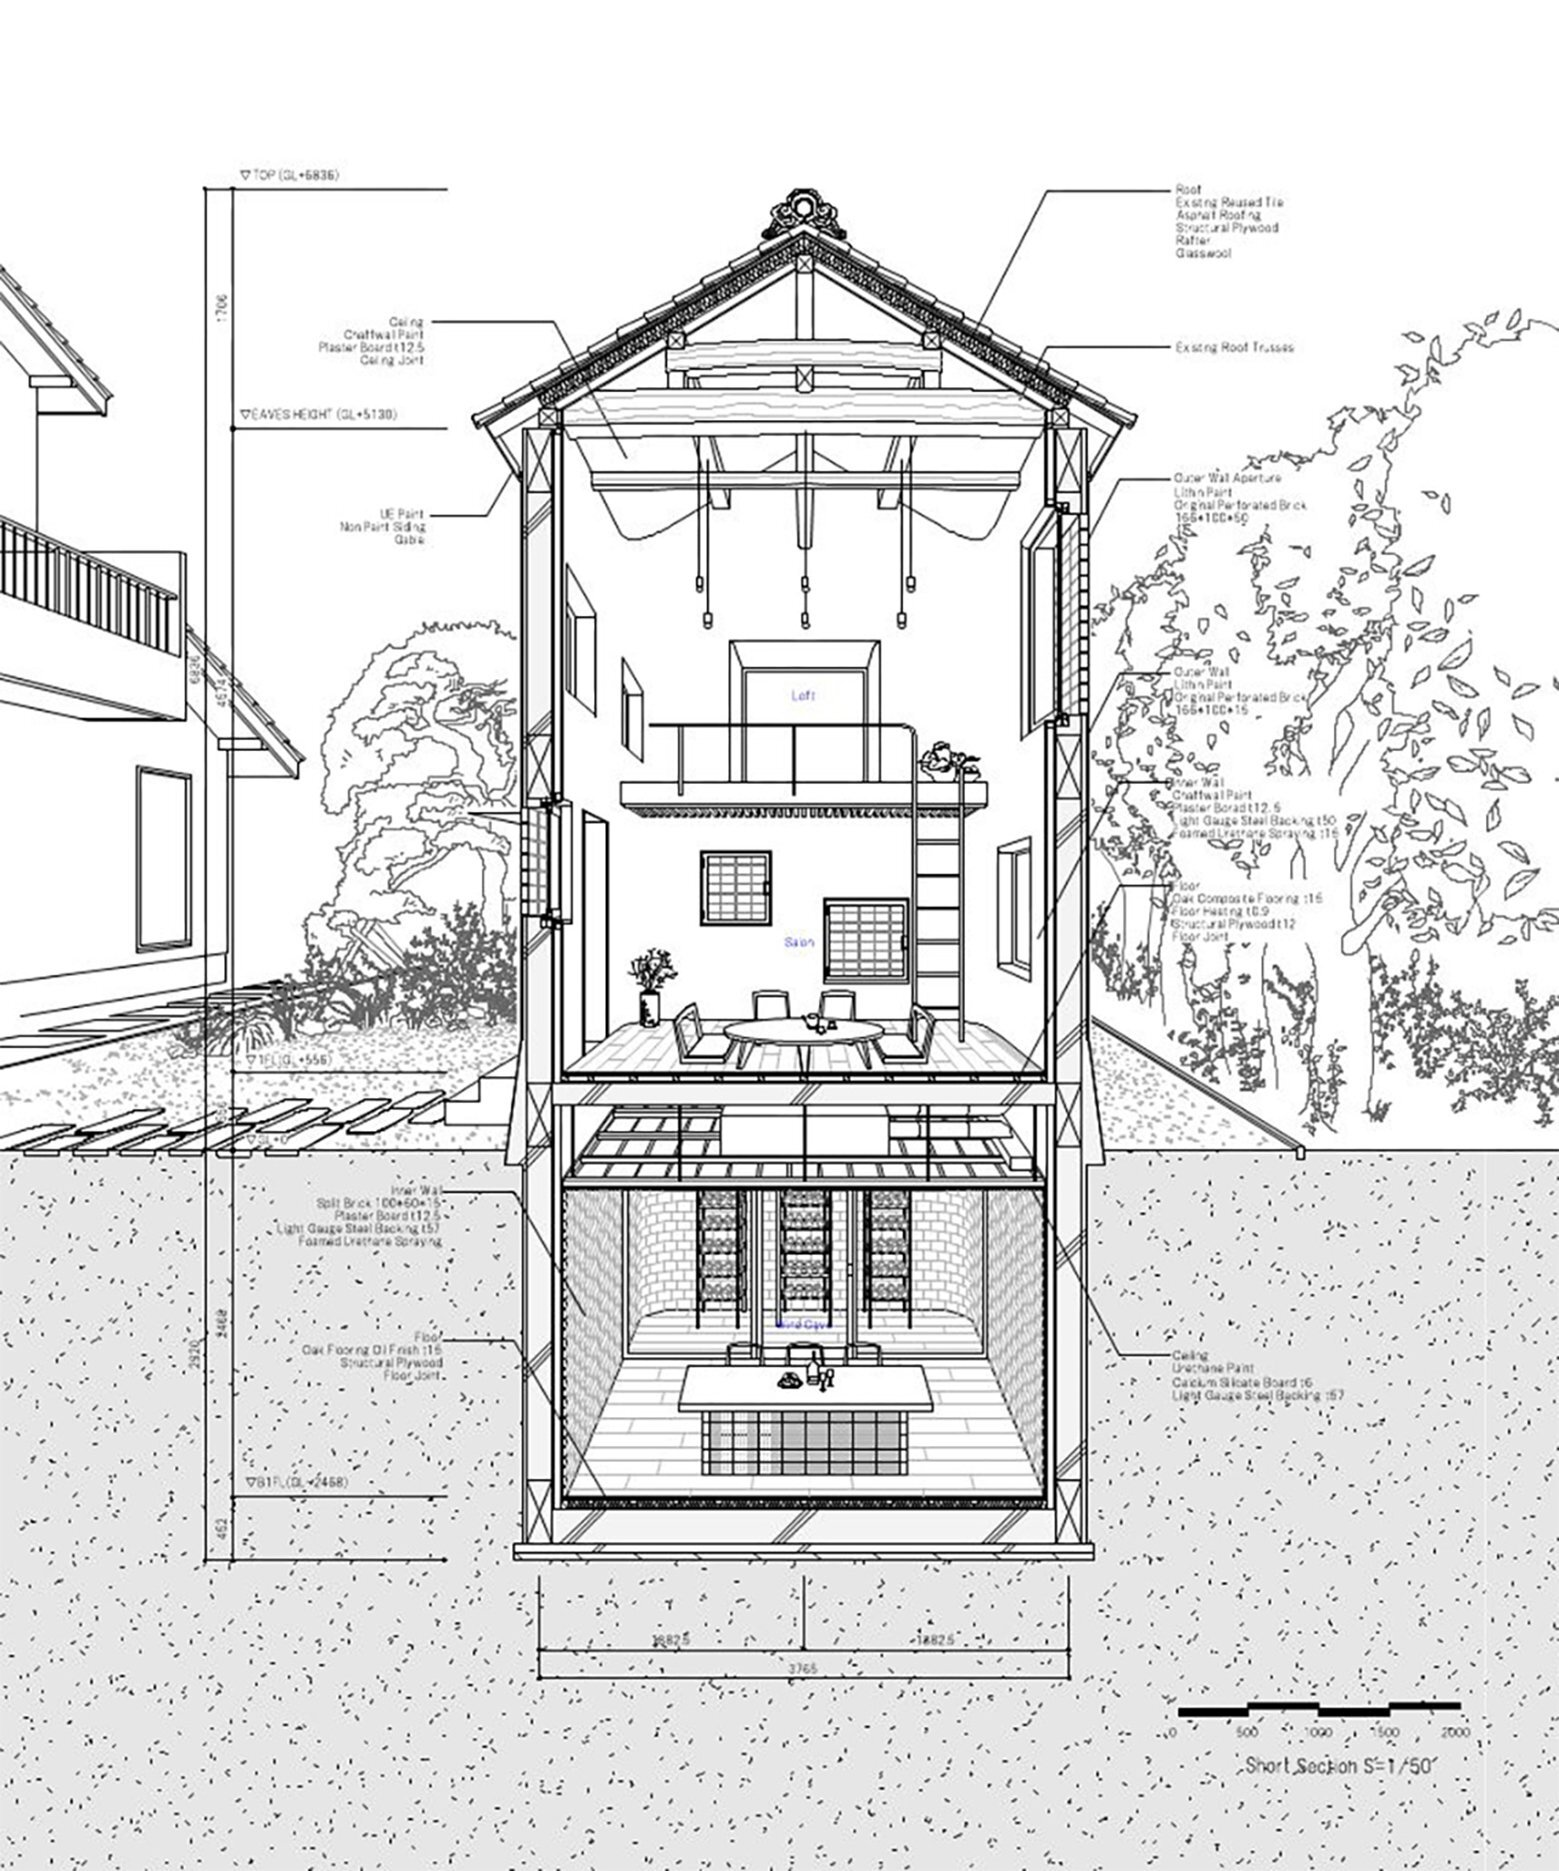 RebirthHouse - Ryo Matsui Architects - Japan - Cross-Section - Humble Homes